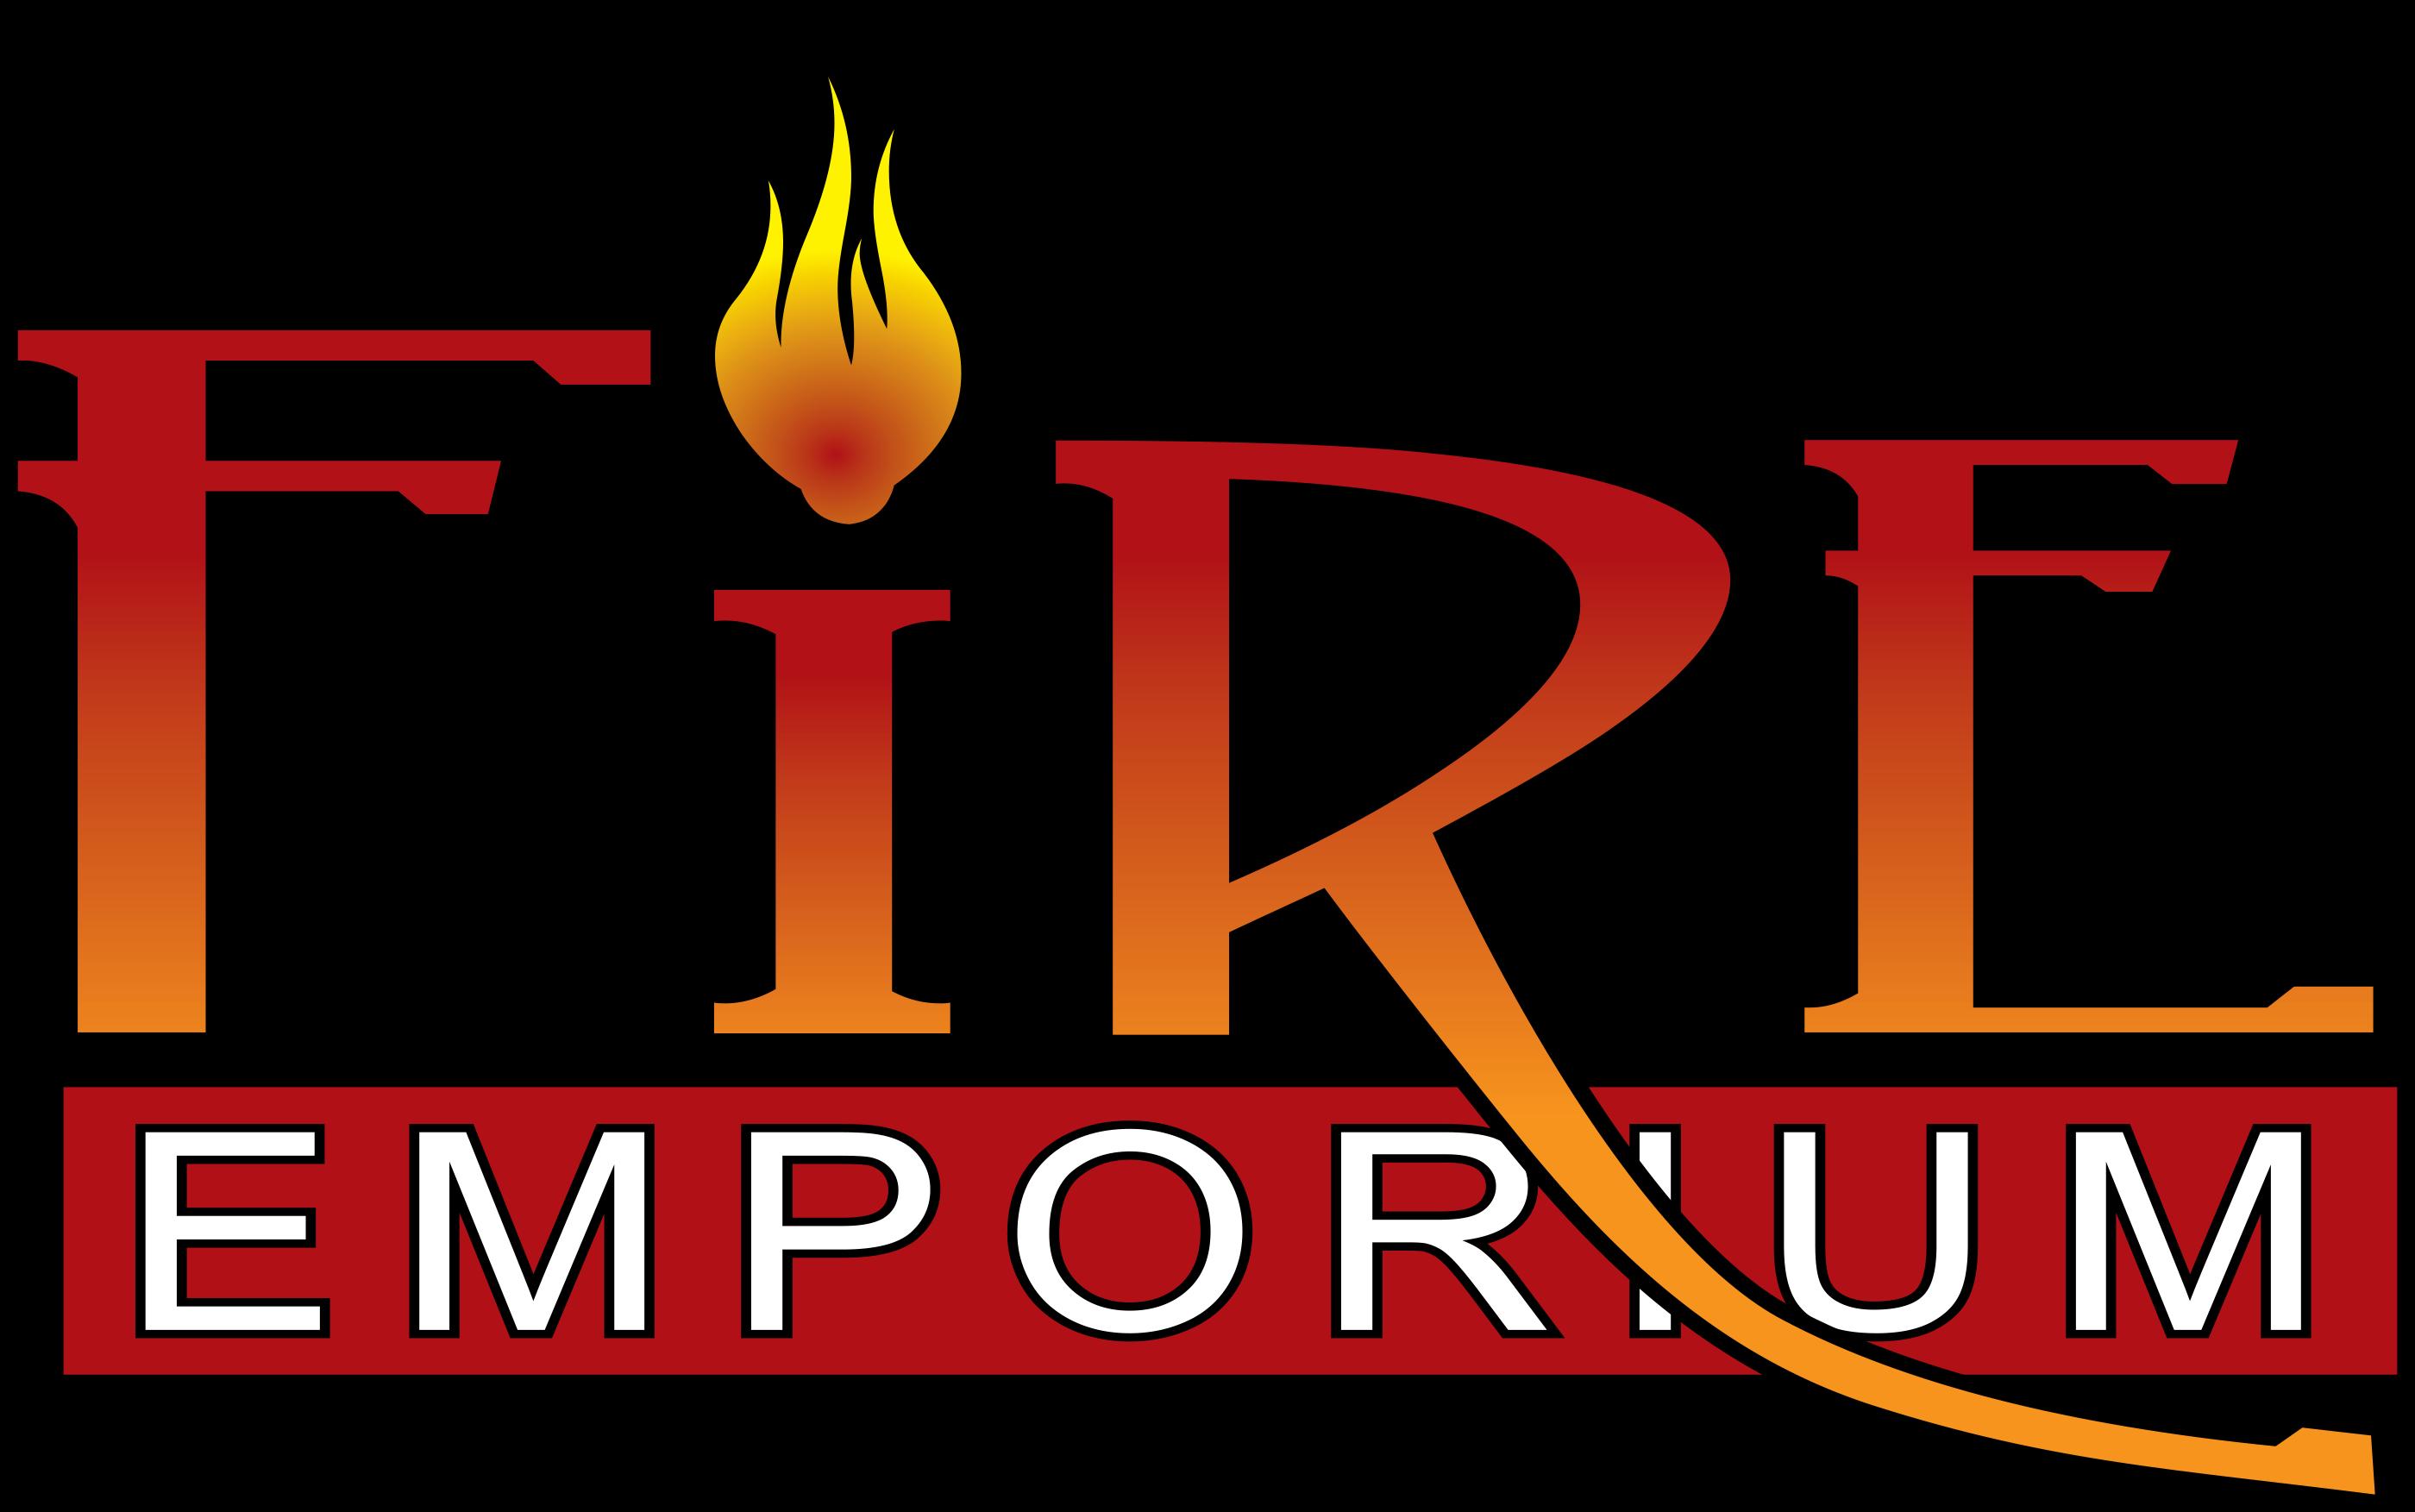 The Fire Emporium